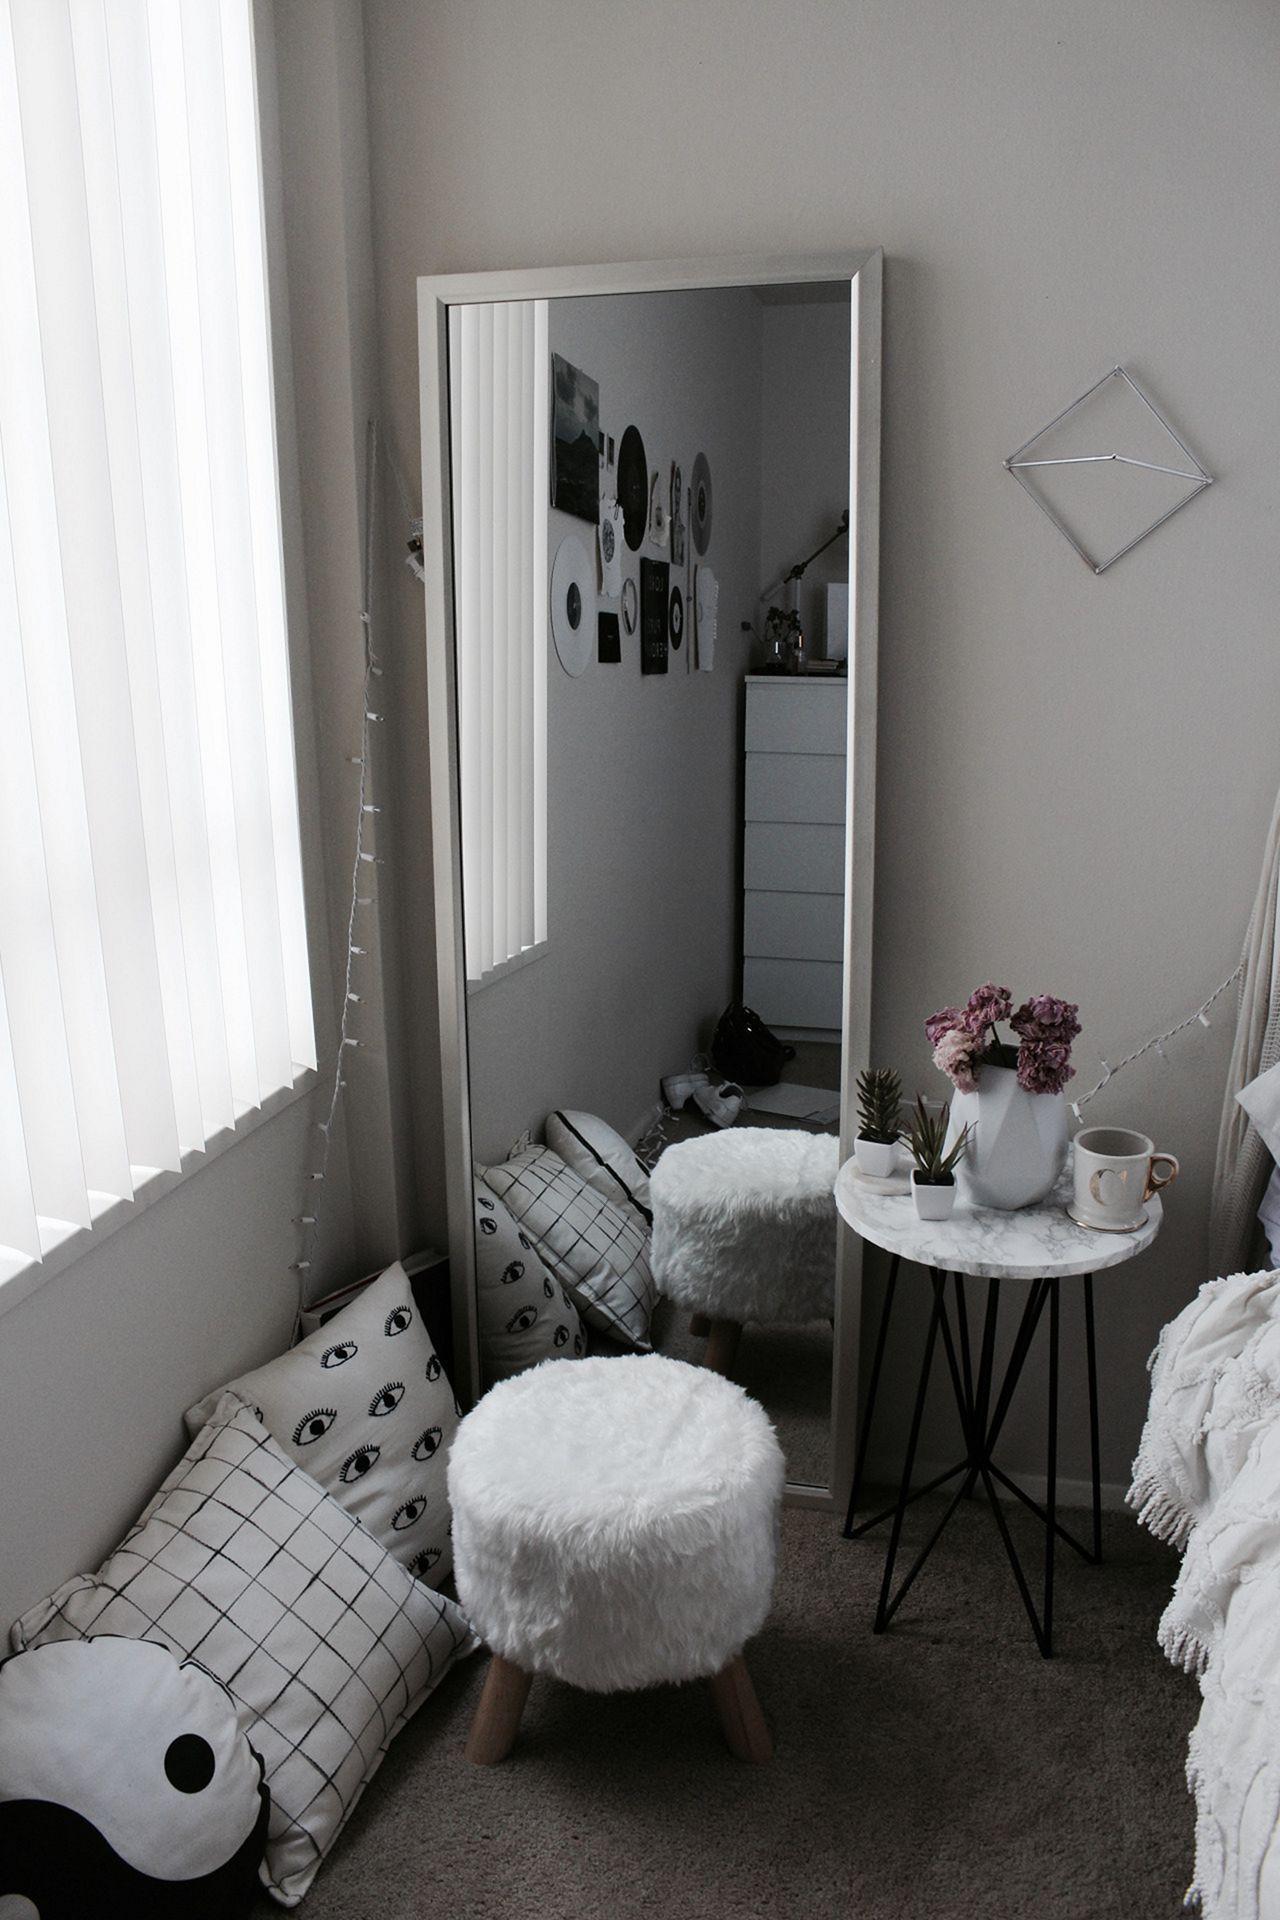 Small Aesthetic Bedroom Ideas Small Aesthetic Bedroom Ideas